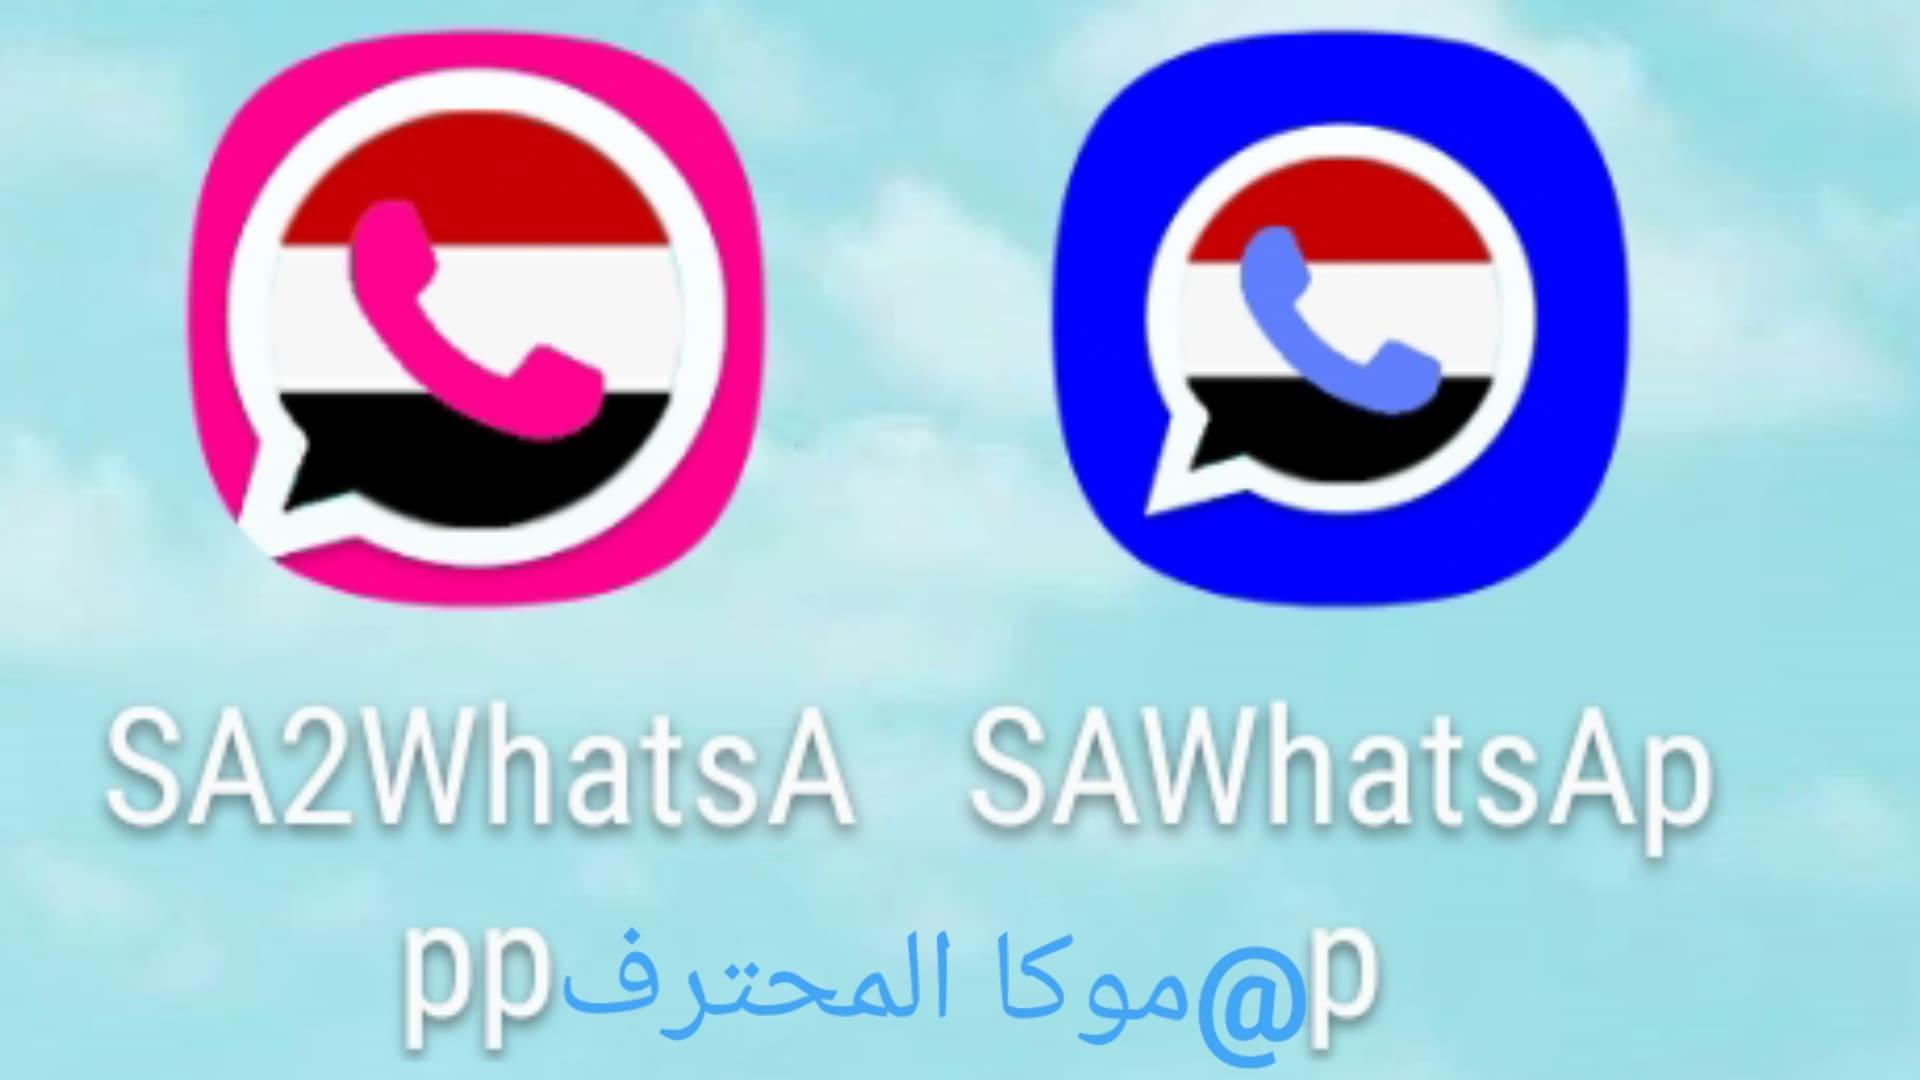 تحميل واتساب صنعاء الازرق والوردي SAWhatsapp اخر اصدار 2020 برابط مباشر.